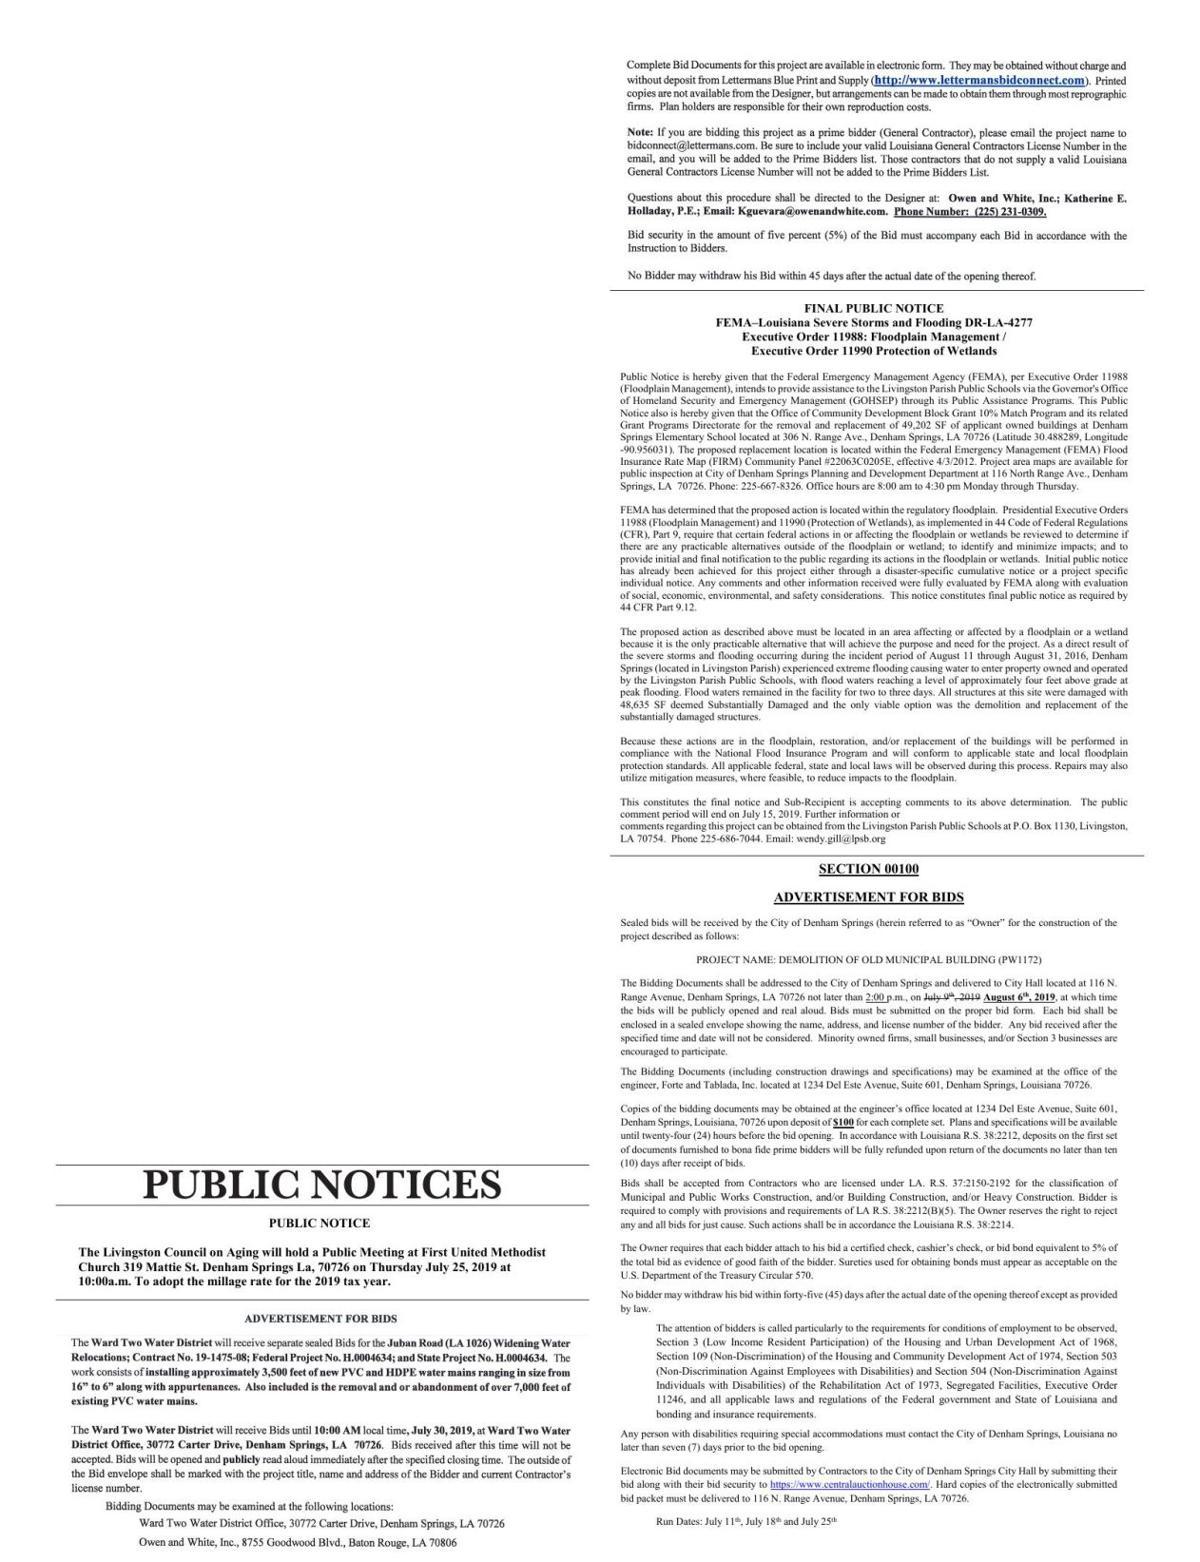 Public Notices published July 11, 2019